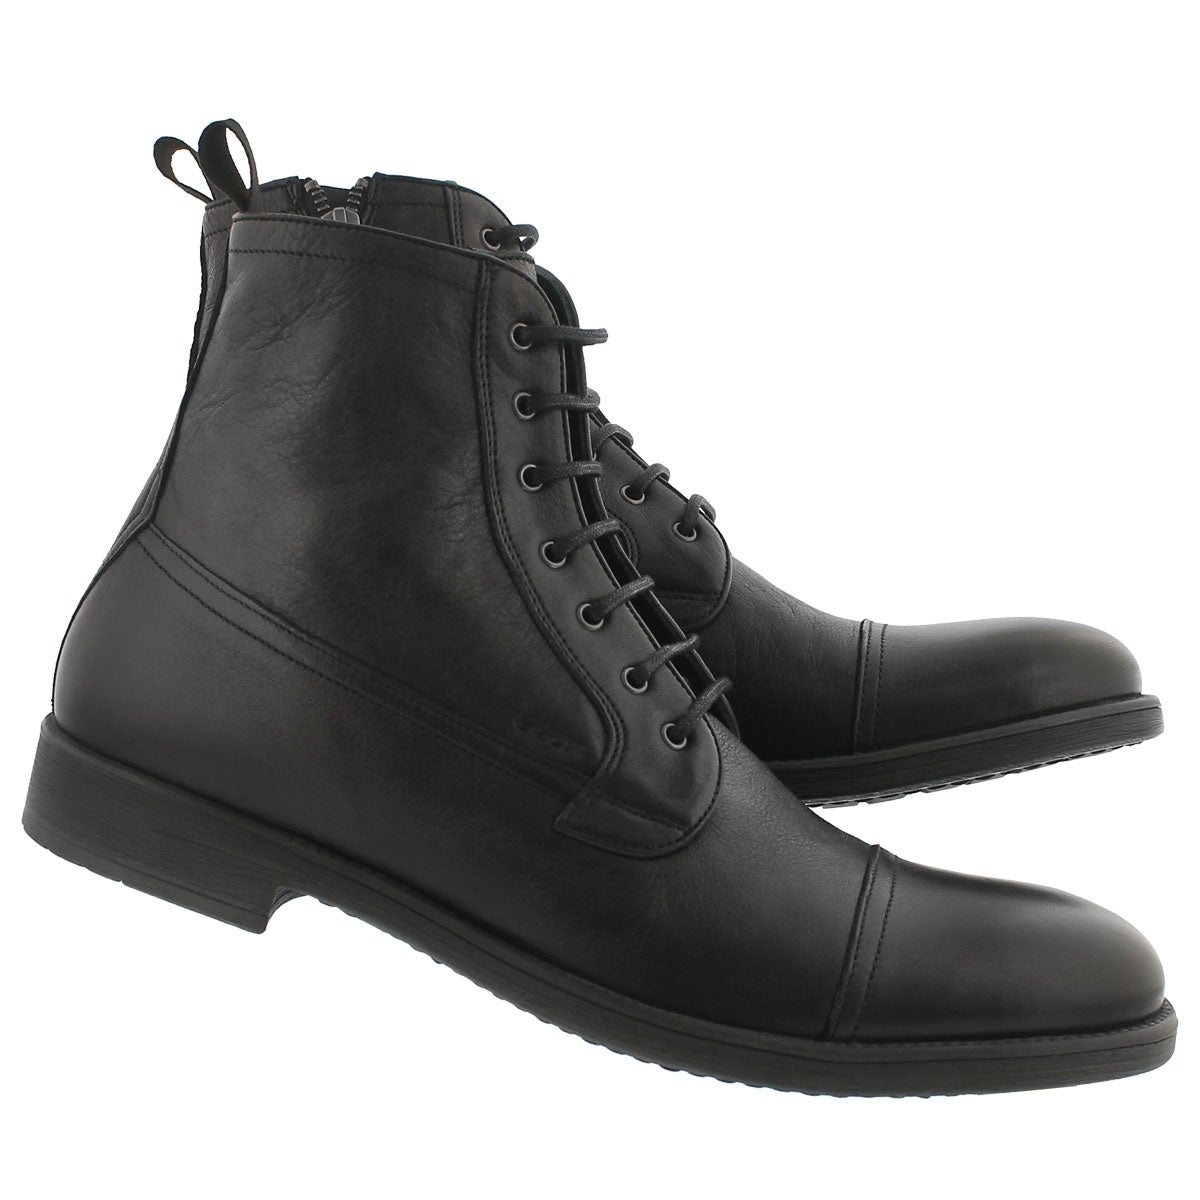 Mns Jaylon black lace up ankle boot